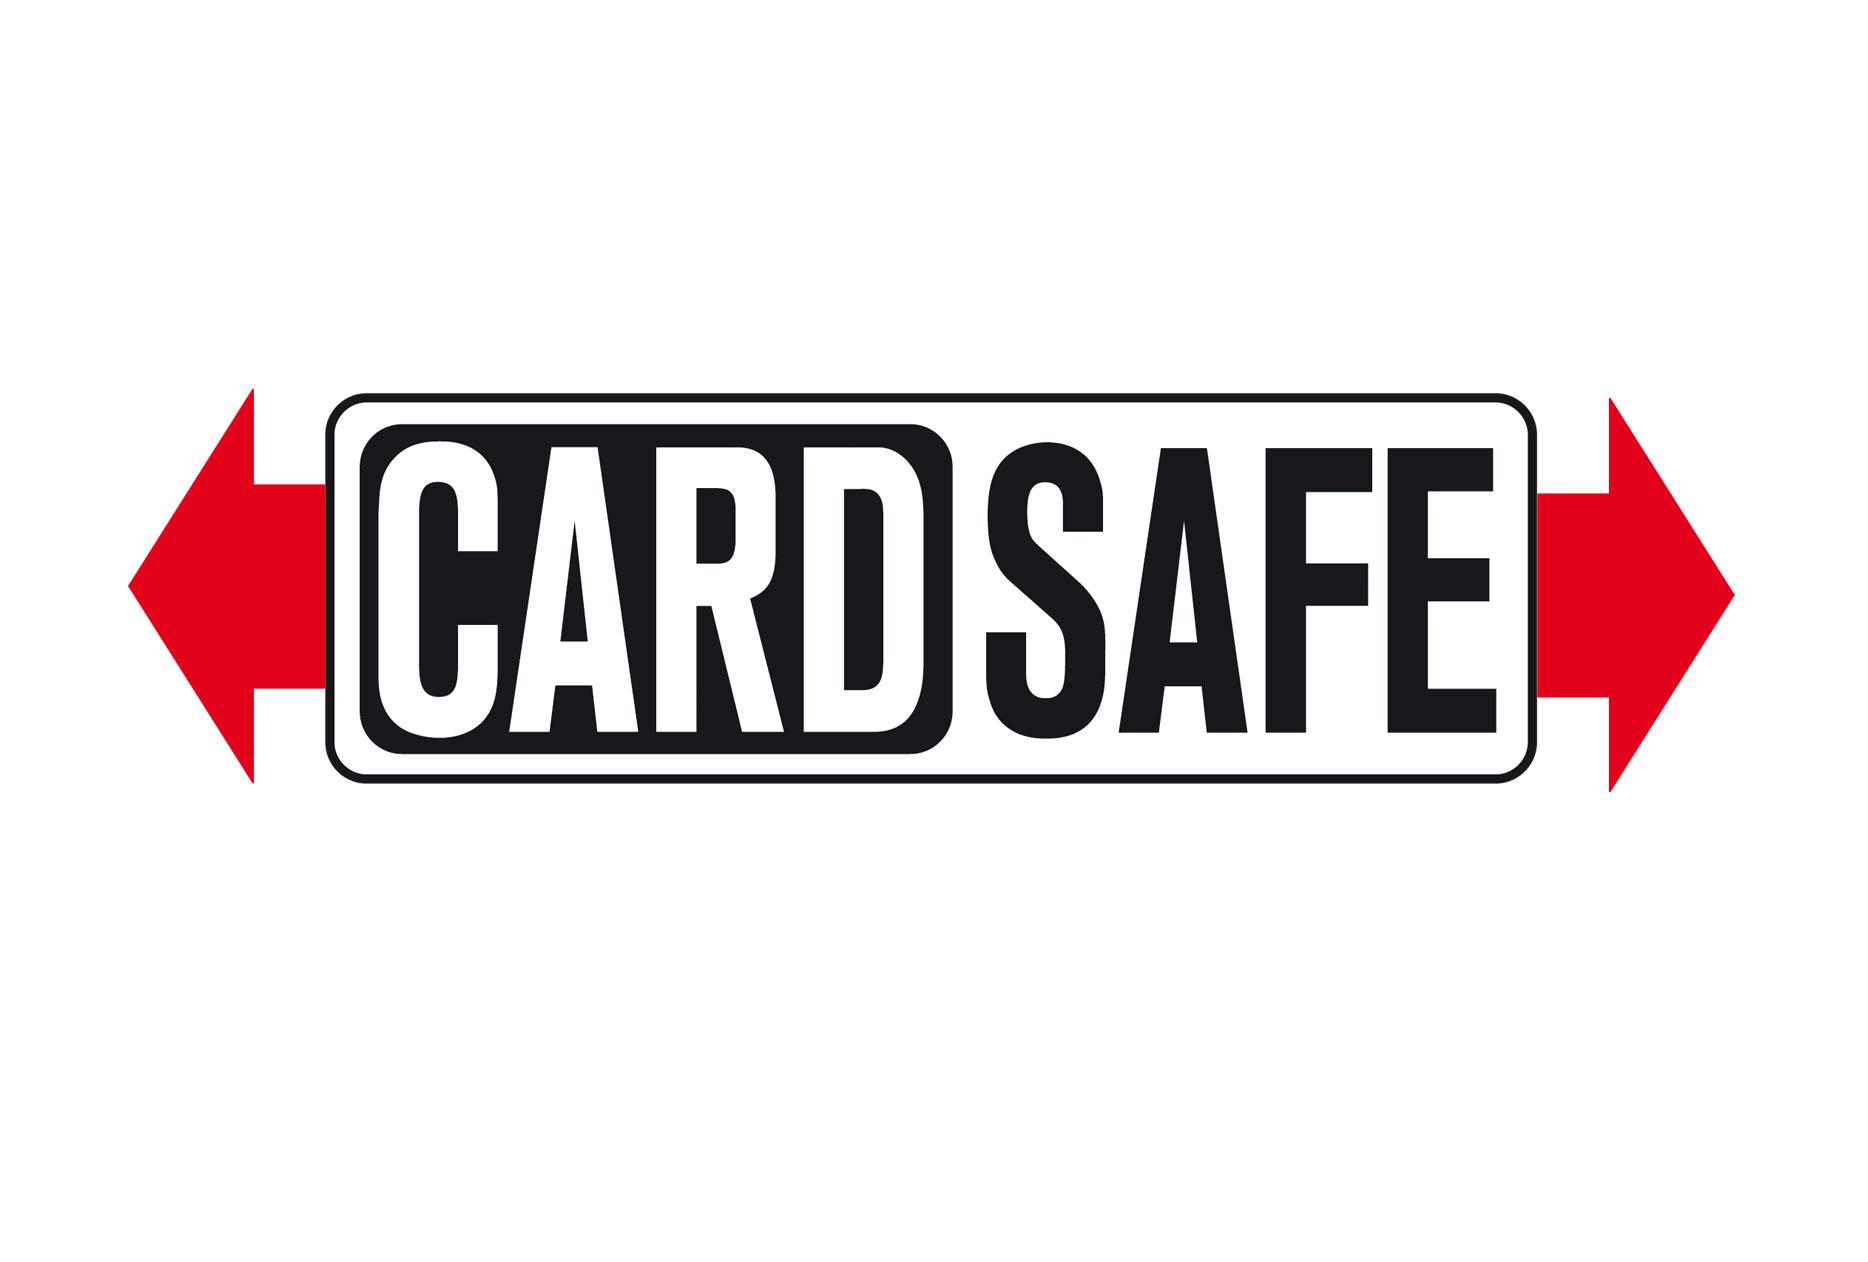 Cardsafe